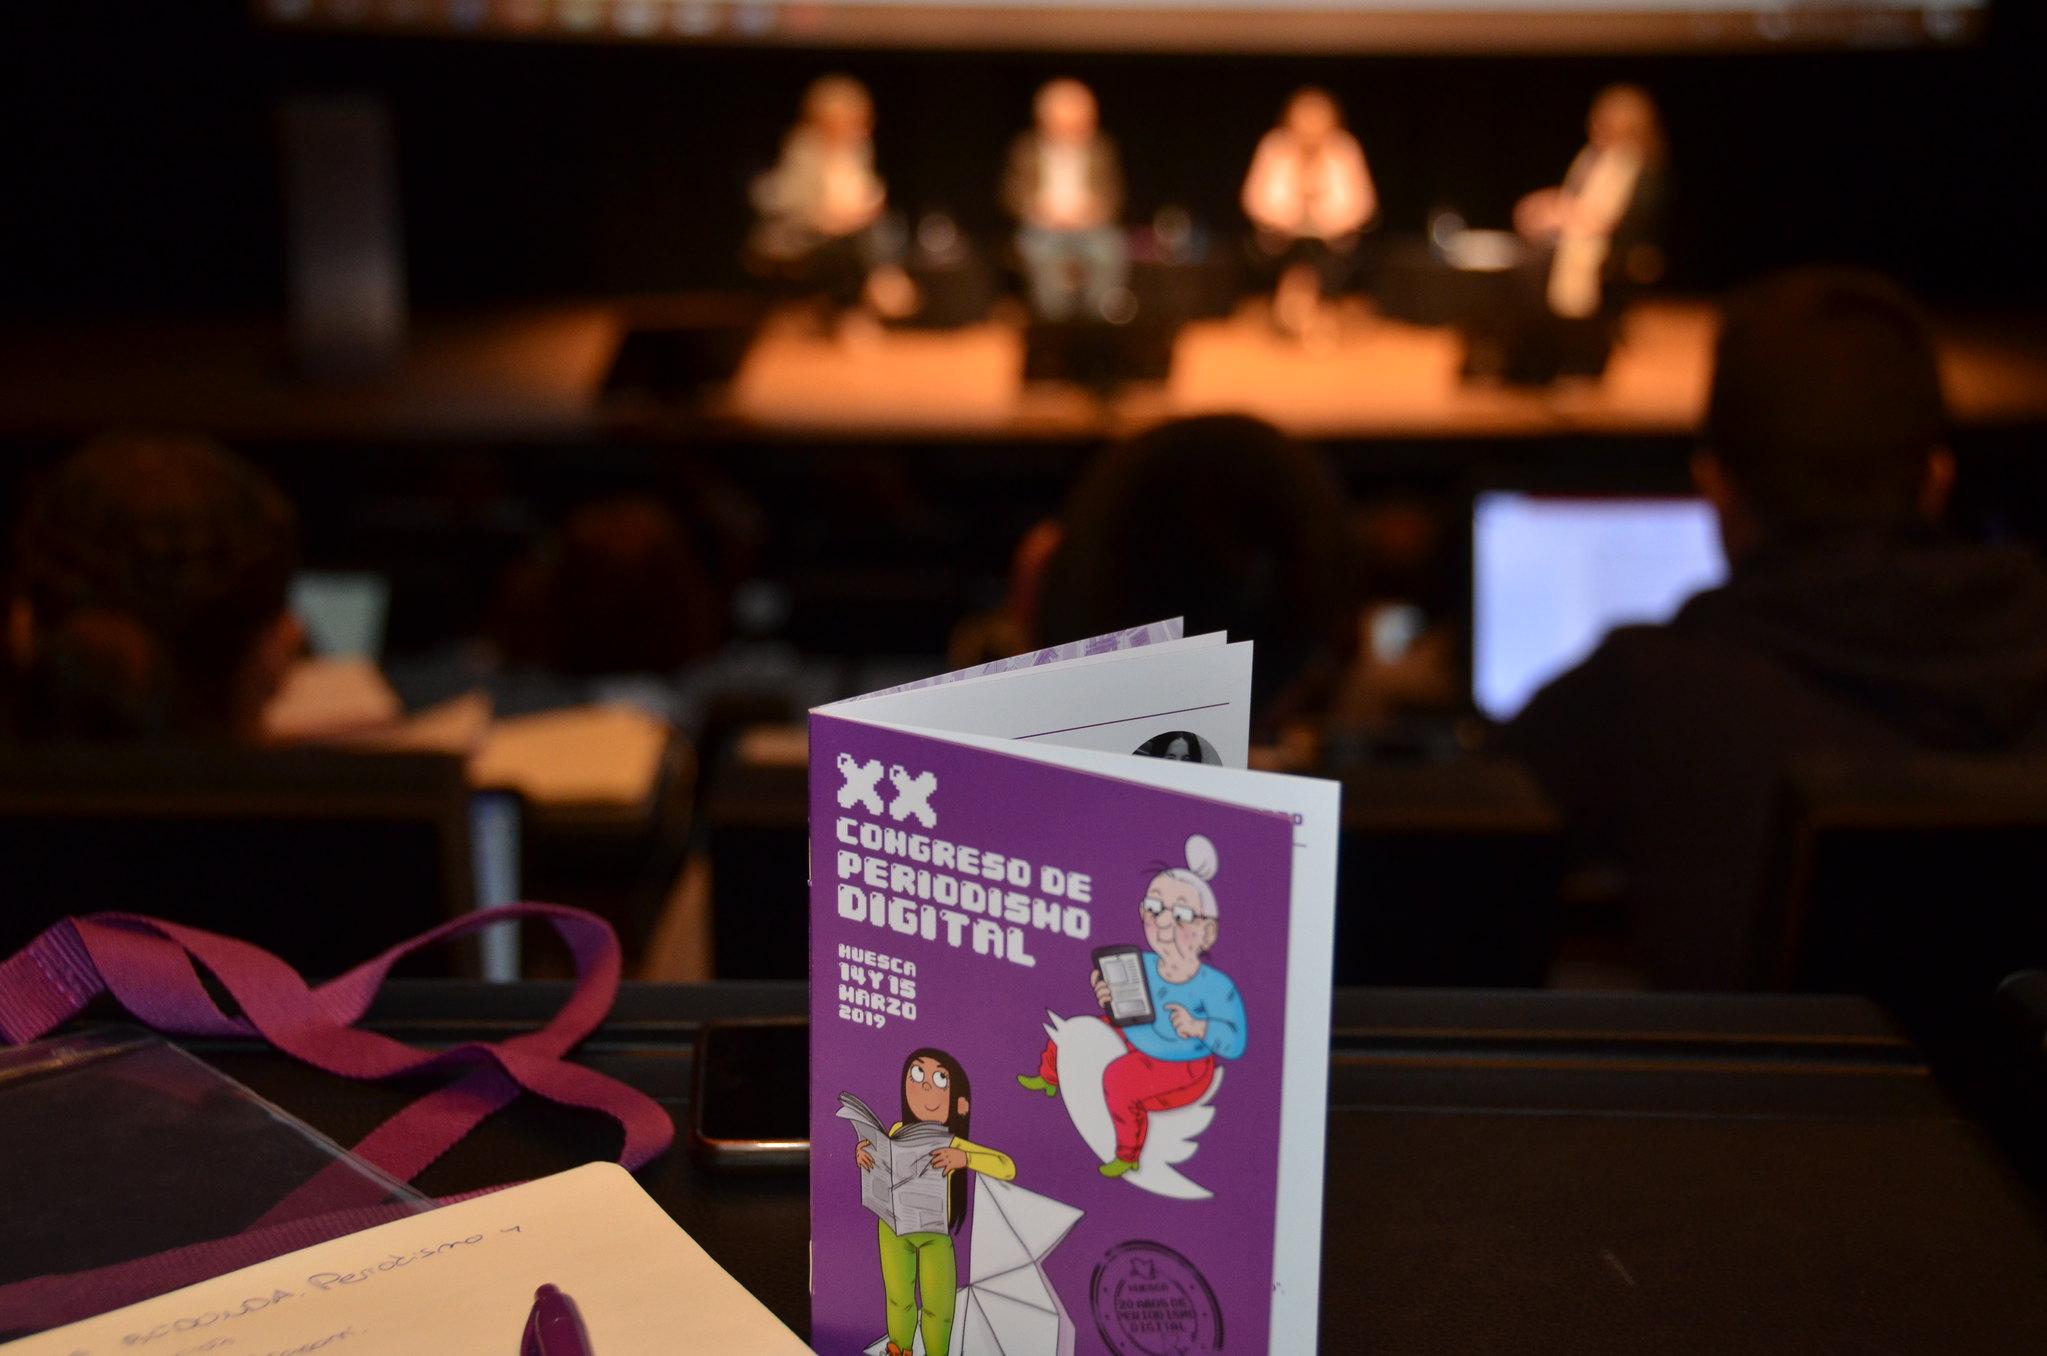 XX Congreso Periodismo Digital Huesca